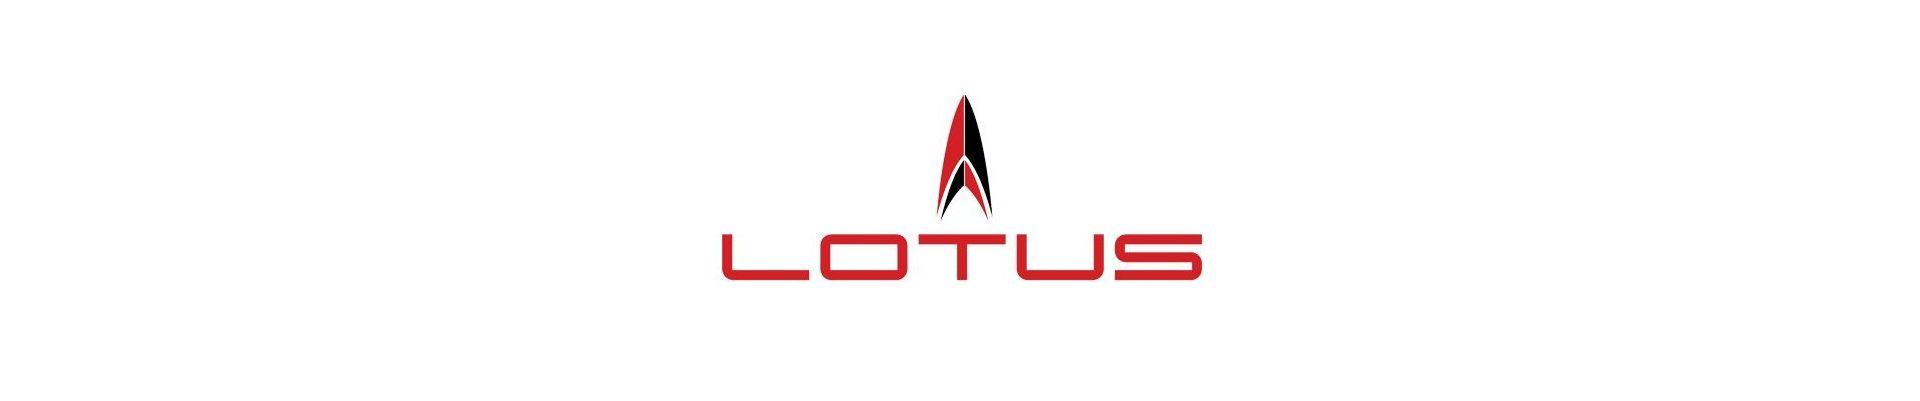 Magazin cu brichete Lotus de vanzare cu livrare